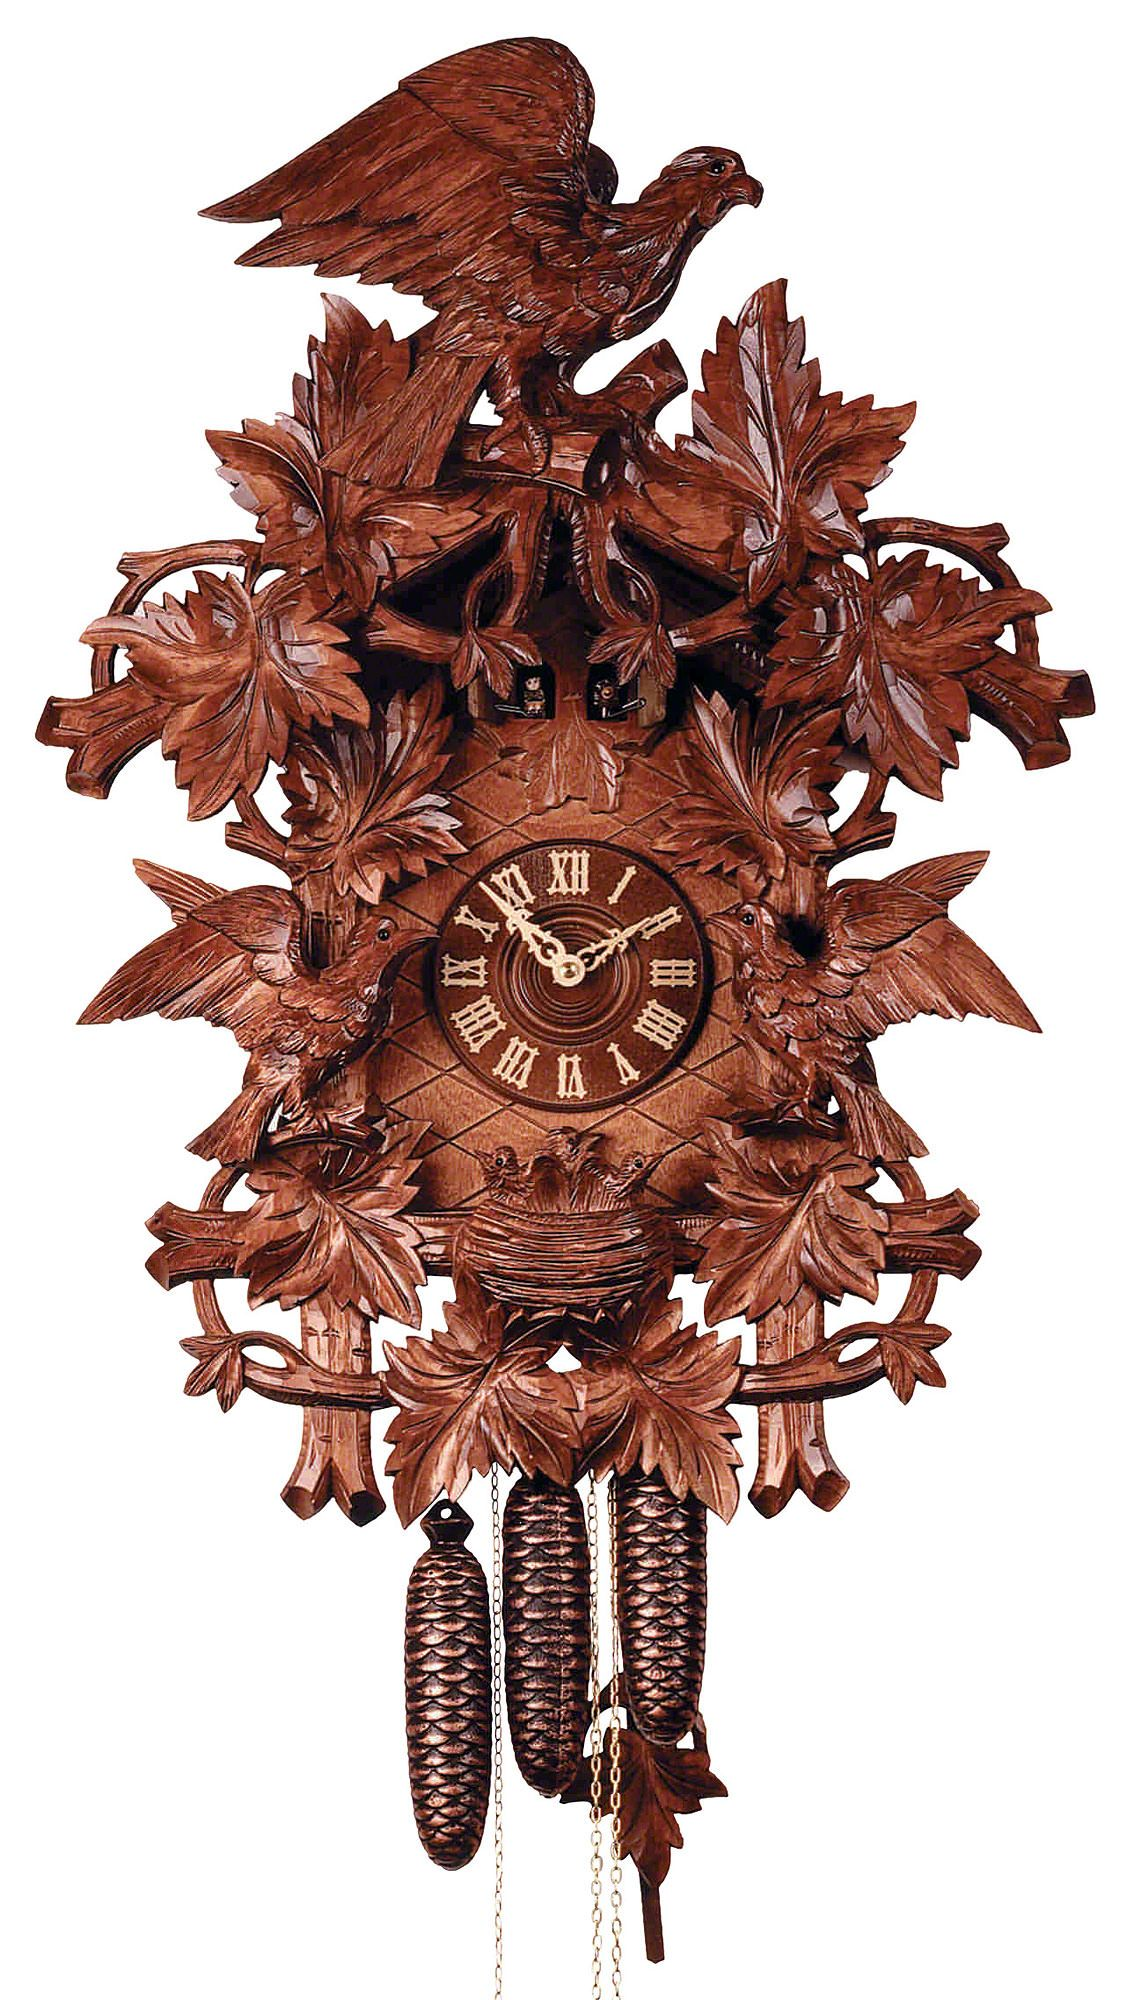 Reloj De Cuco Estilo Madera Tallada Movimiento Mecánico De 8 Días 70cm De Rombach Haas Reloj De Cuco Relojes De Pared Reloj De Péndulo